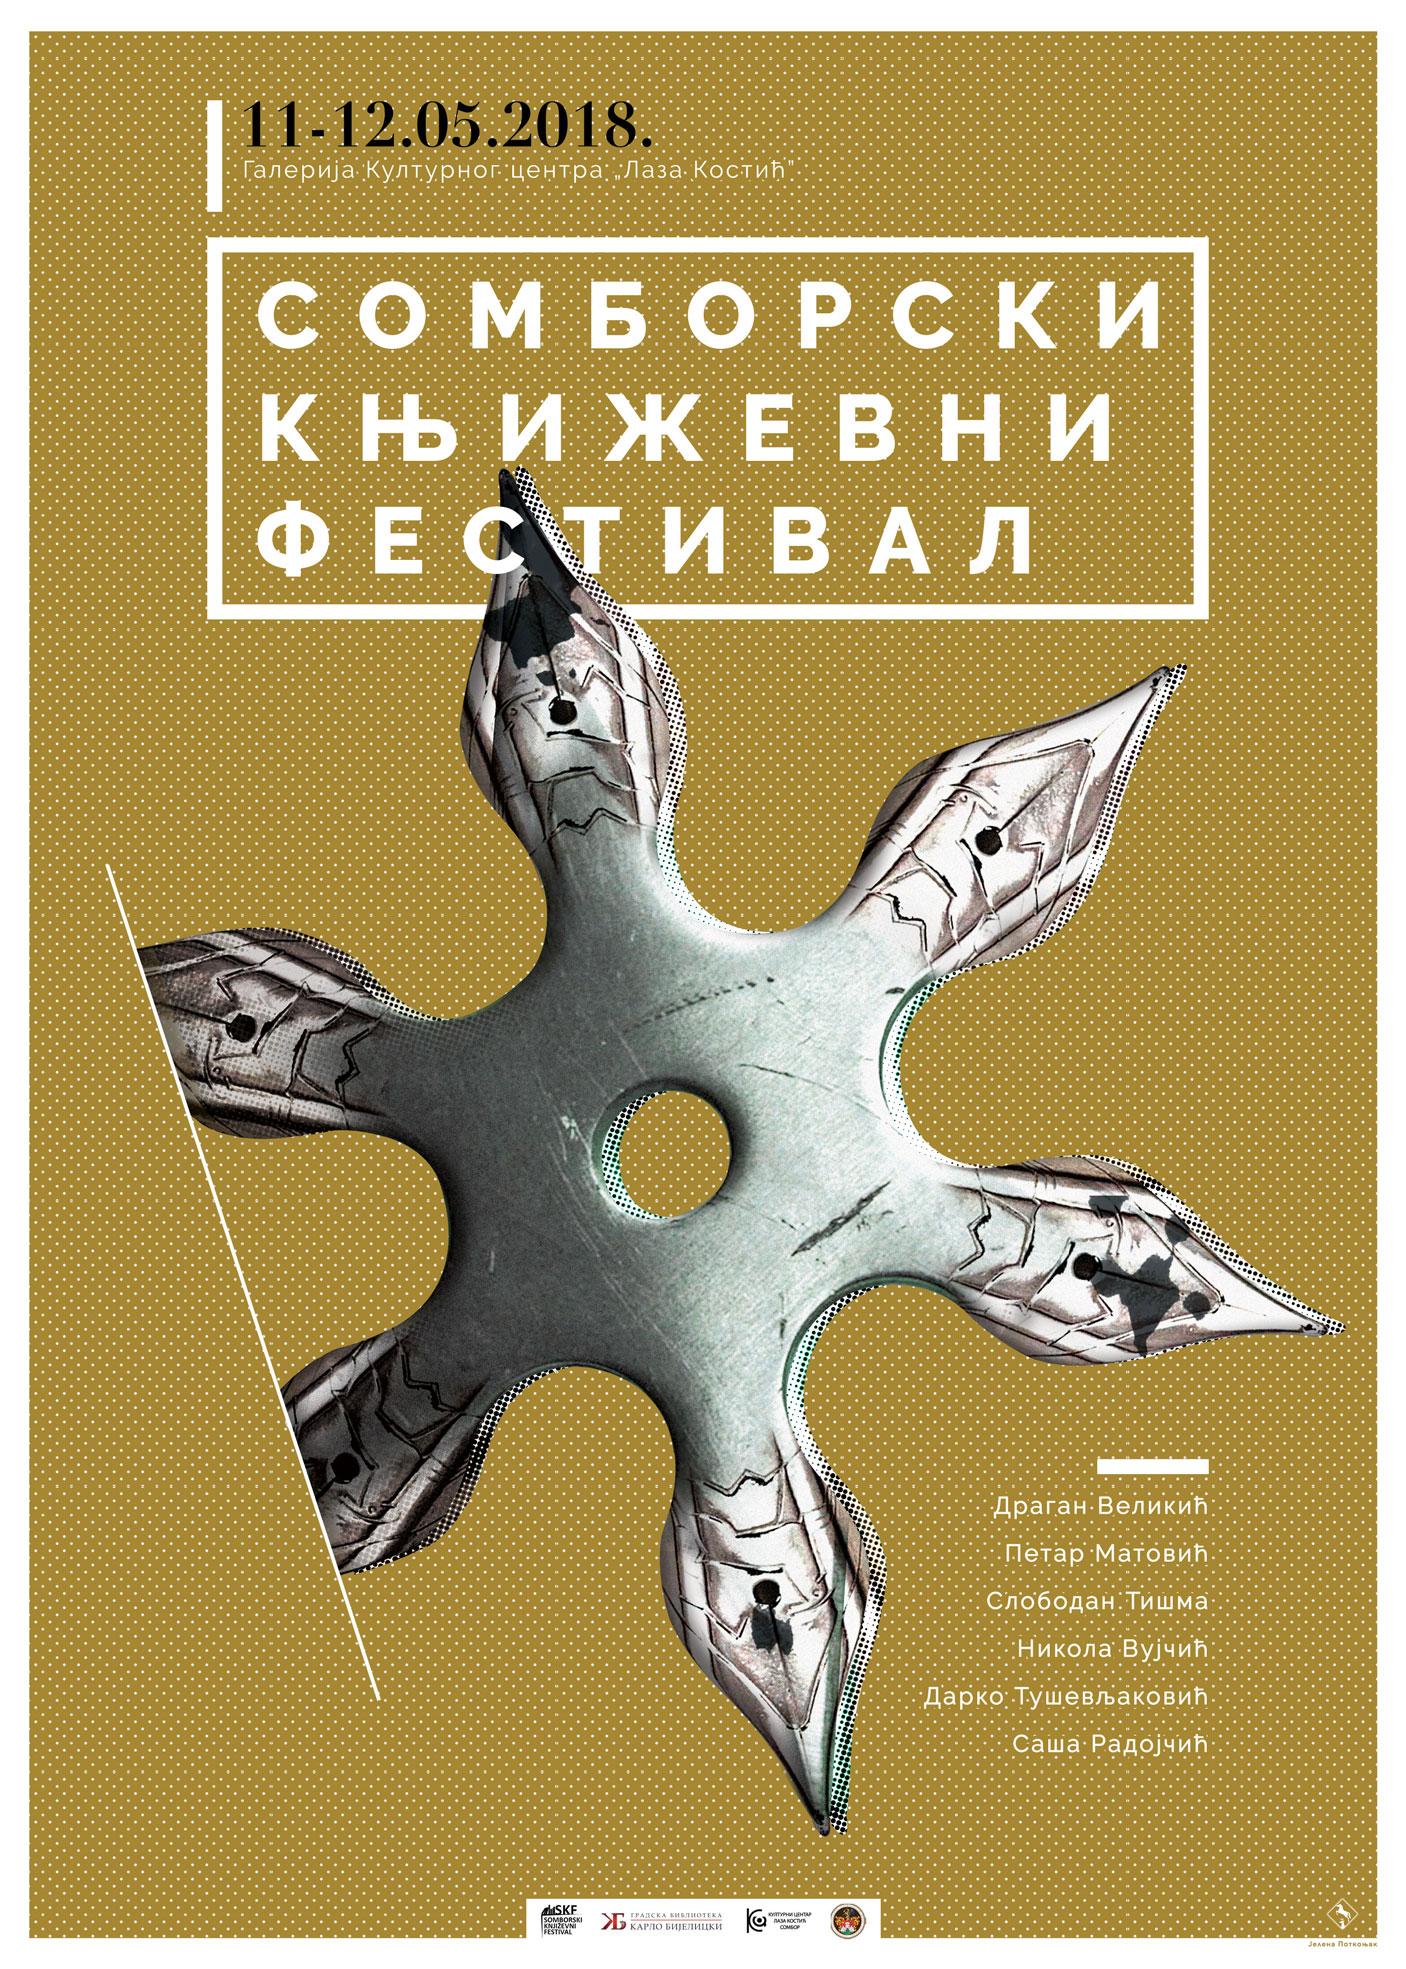 Treći Somborski književni festival